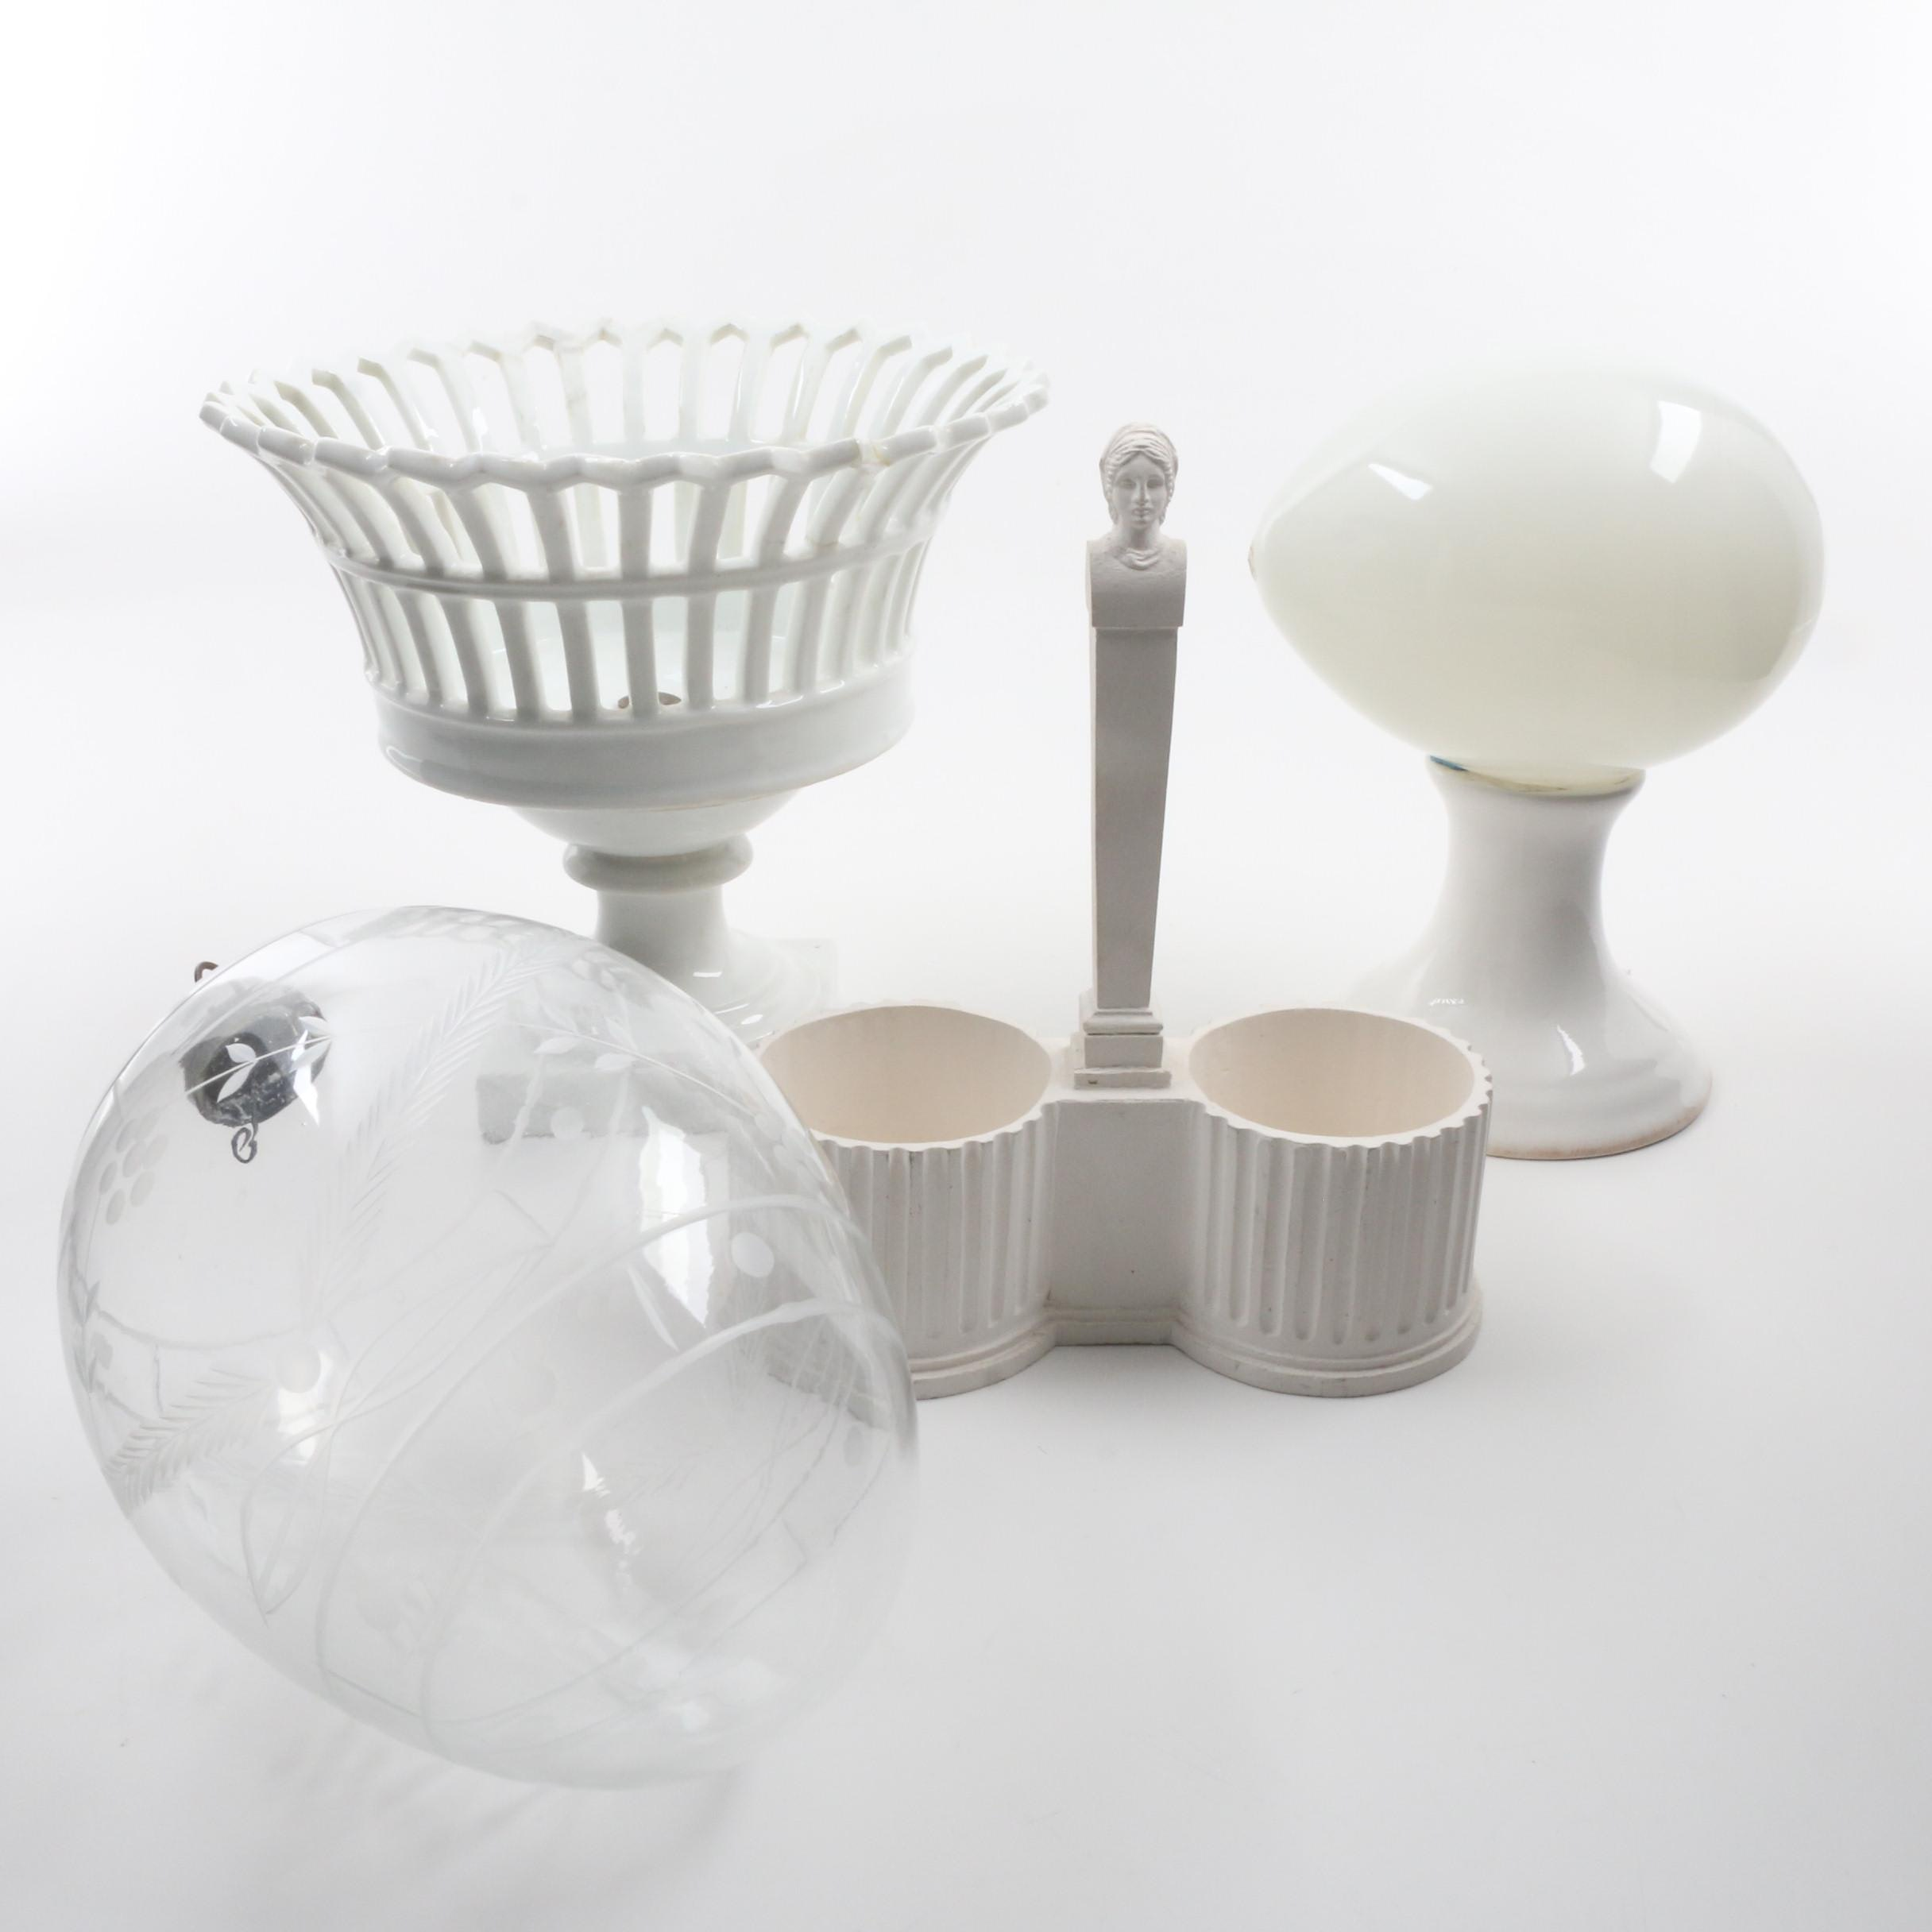 Becks Cruet Stand, Porcelain Compote and Glass Egg